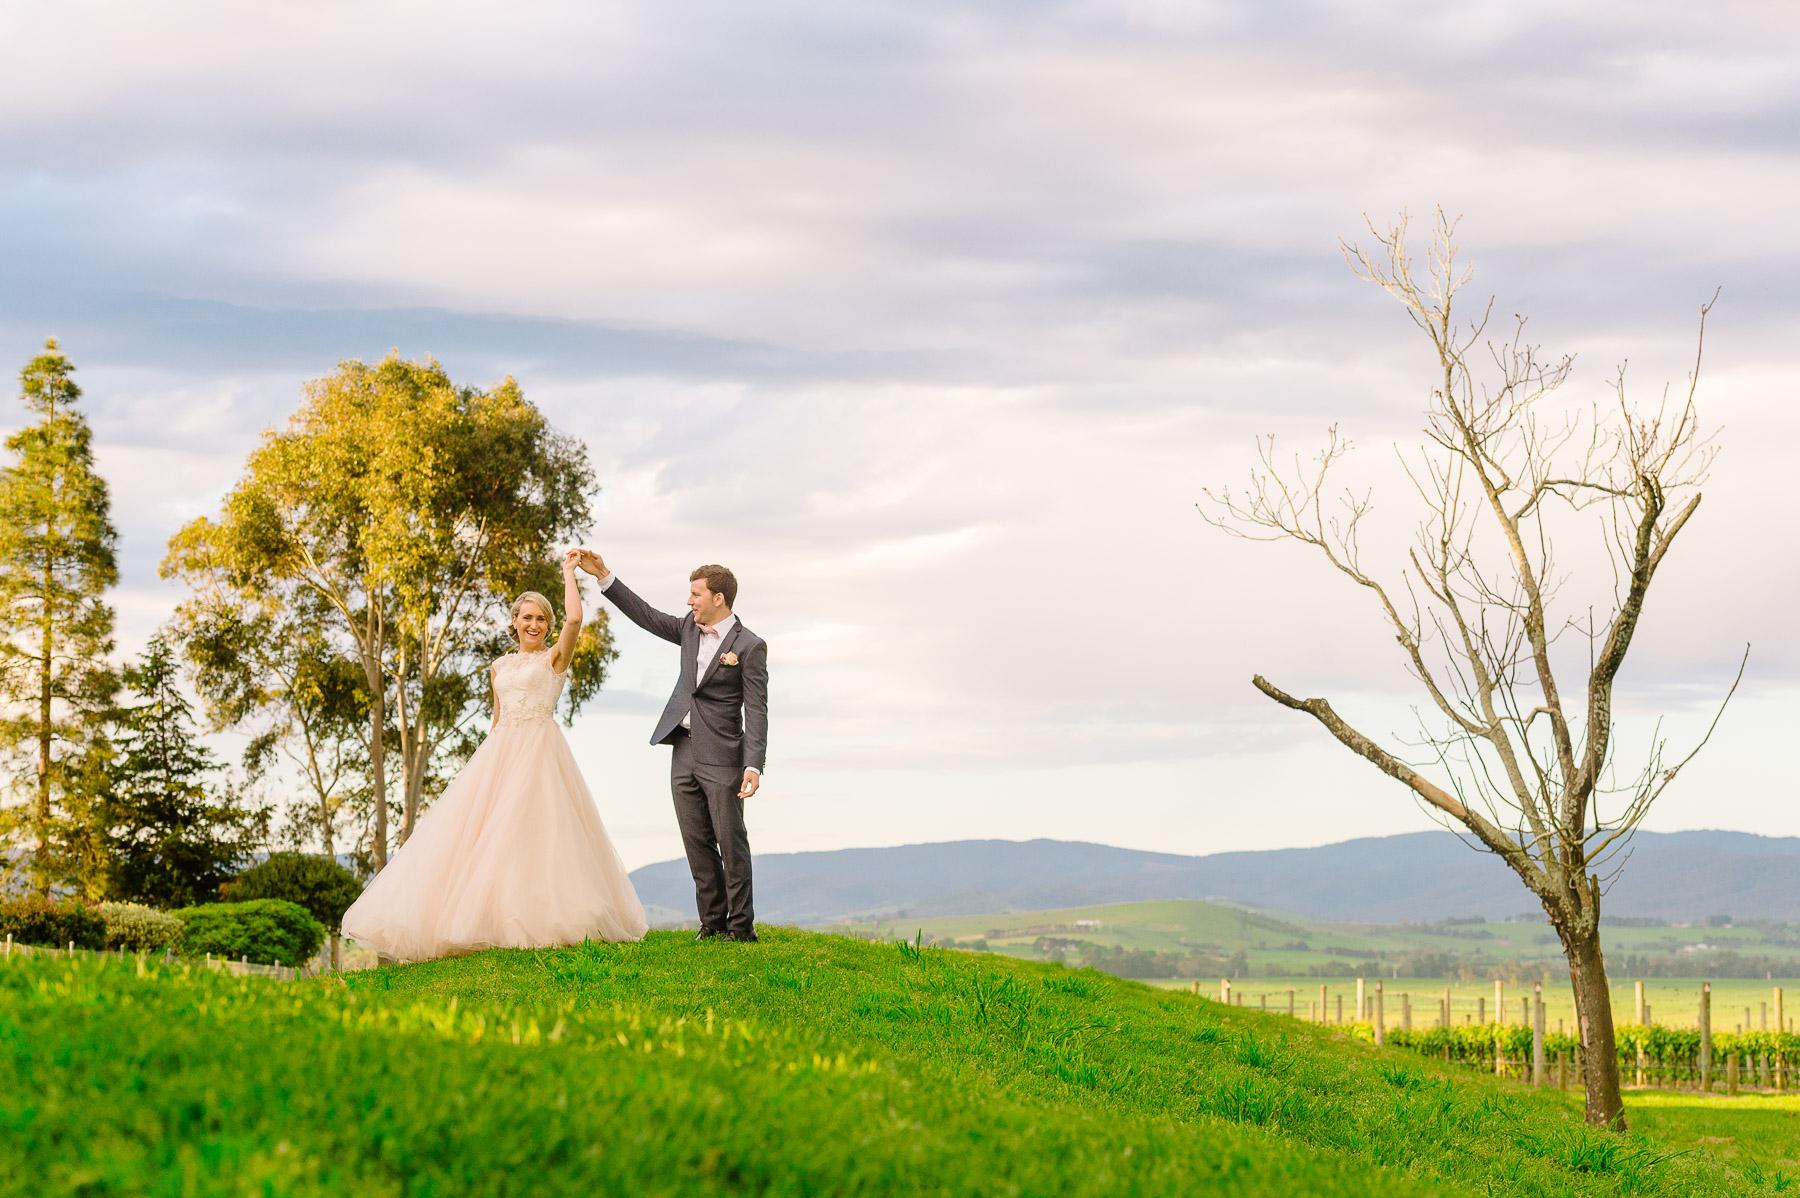 Marnie_and_Charlie_Yarra_Valley_Wedding_Blog-70.jpg